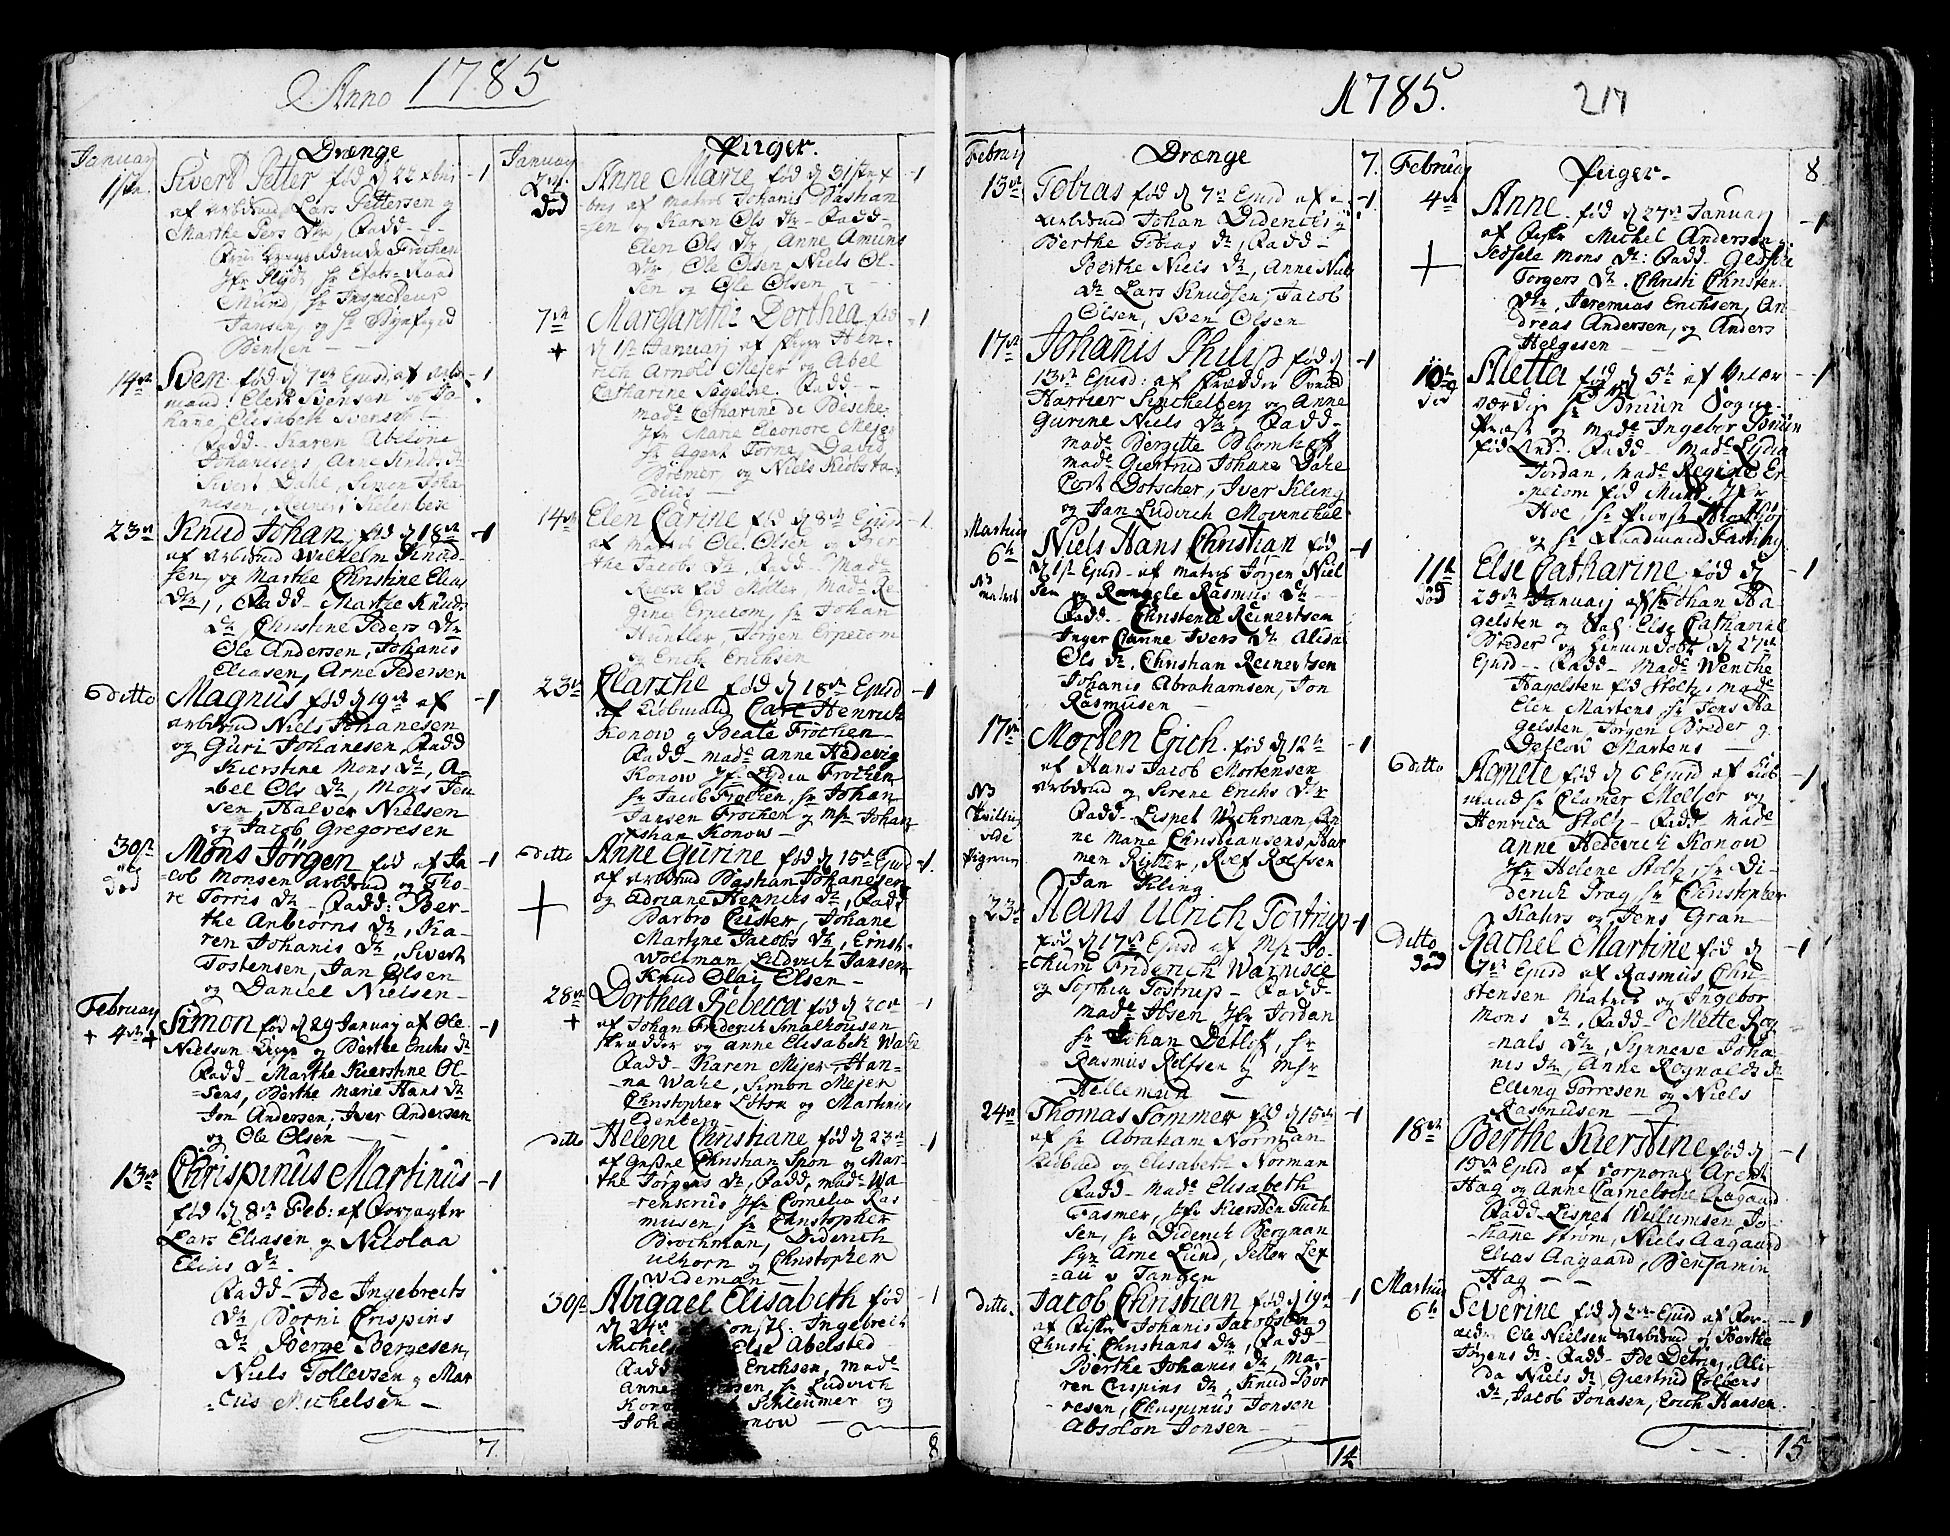 SAB, Korskirken Sokneprestembete, H/Haa/L0005: Ministerialbok nr. A 5, 1751-1789, s. 217